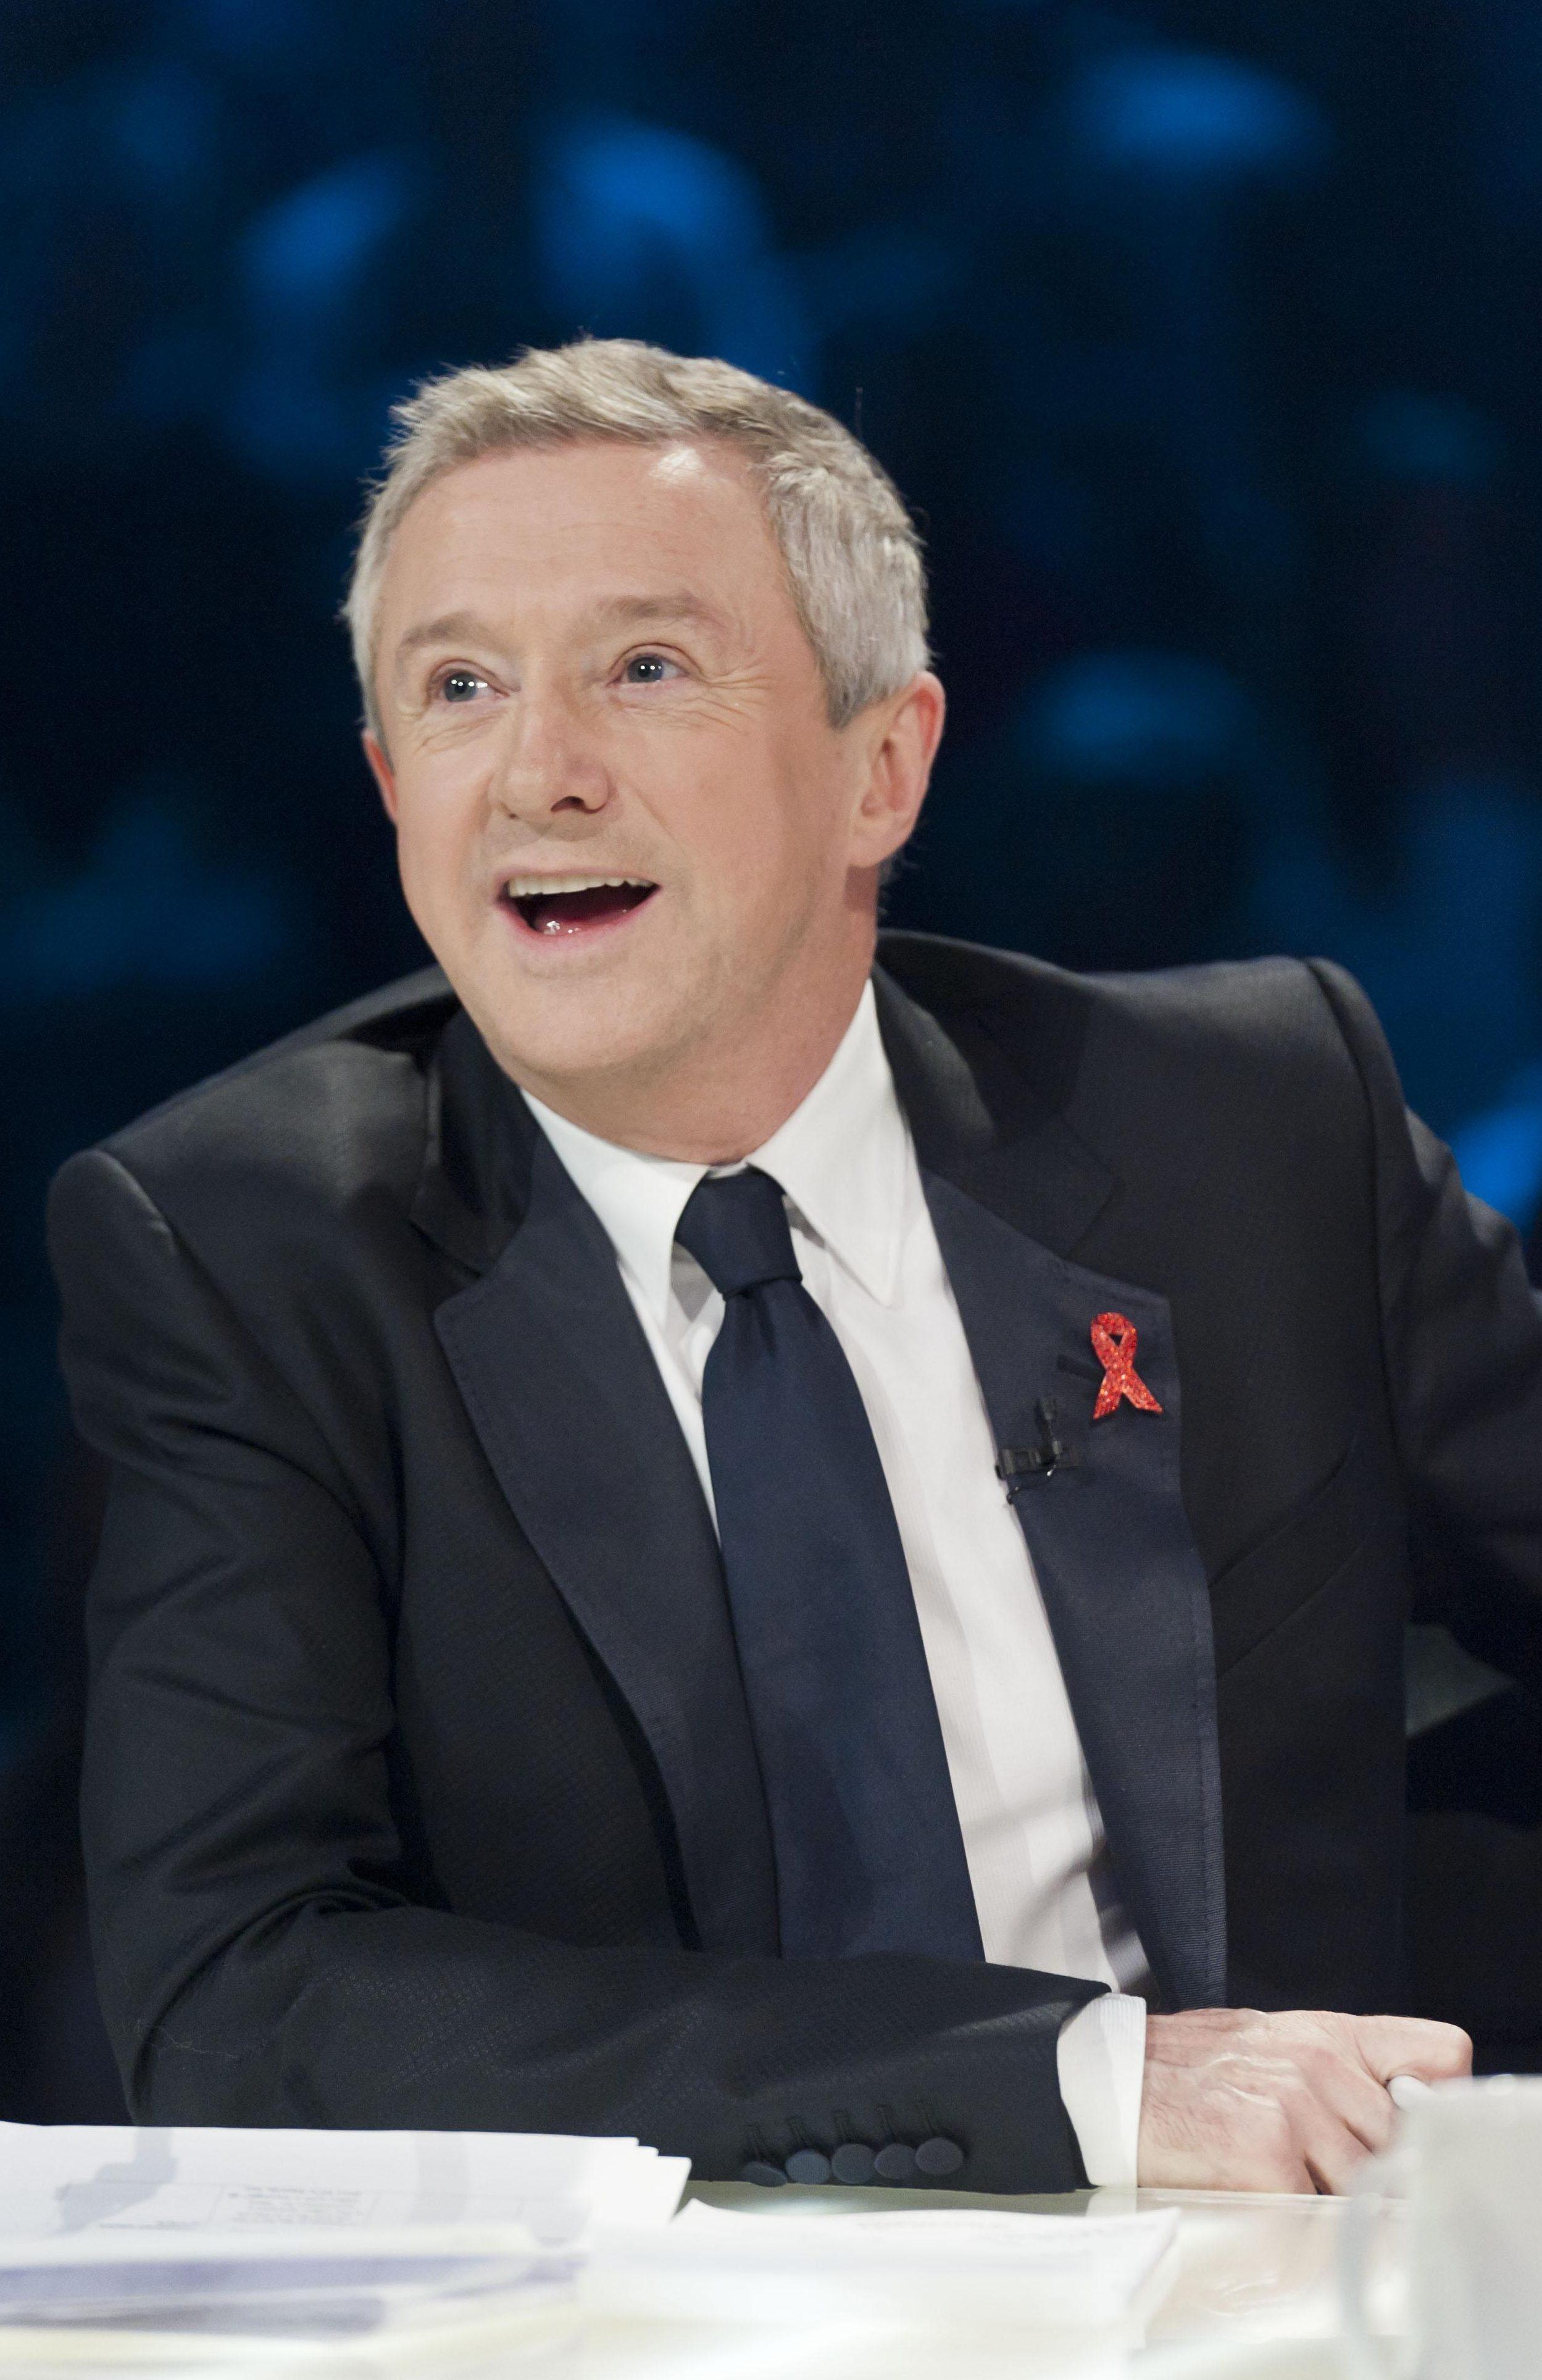 Louis Walsh reveals why Cheryl didn't return to UK X Factor Louis Walsh reveals why Cheryl didn't return to UK X Factor new foto